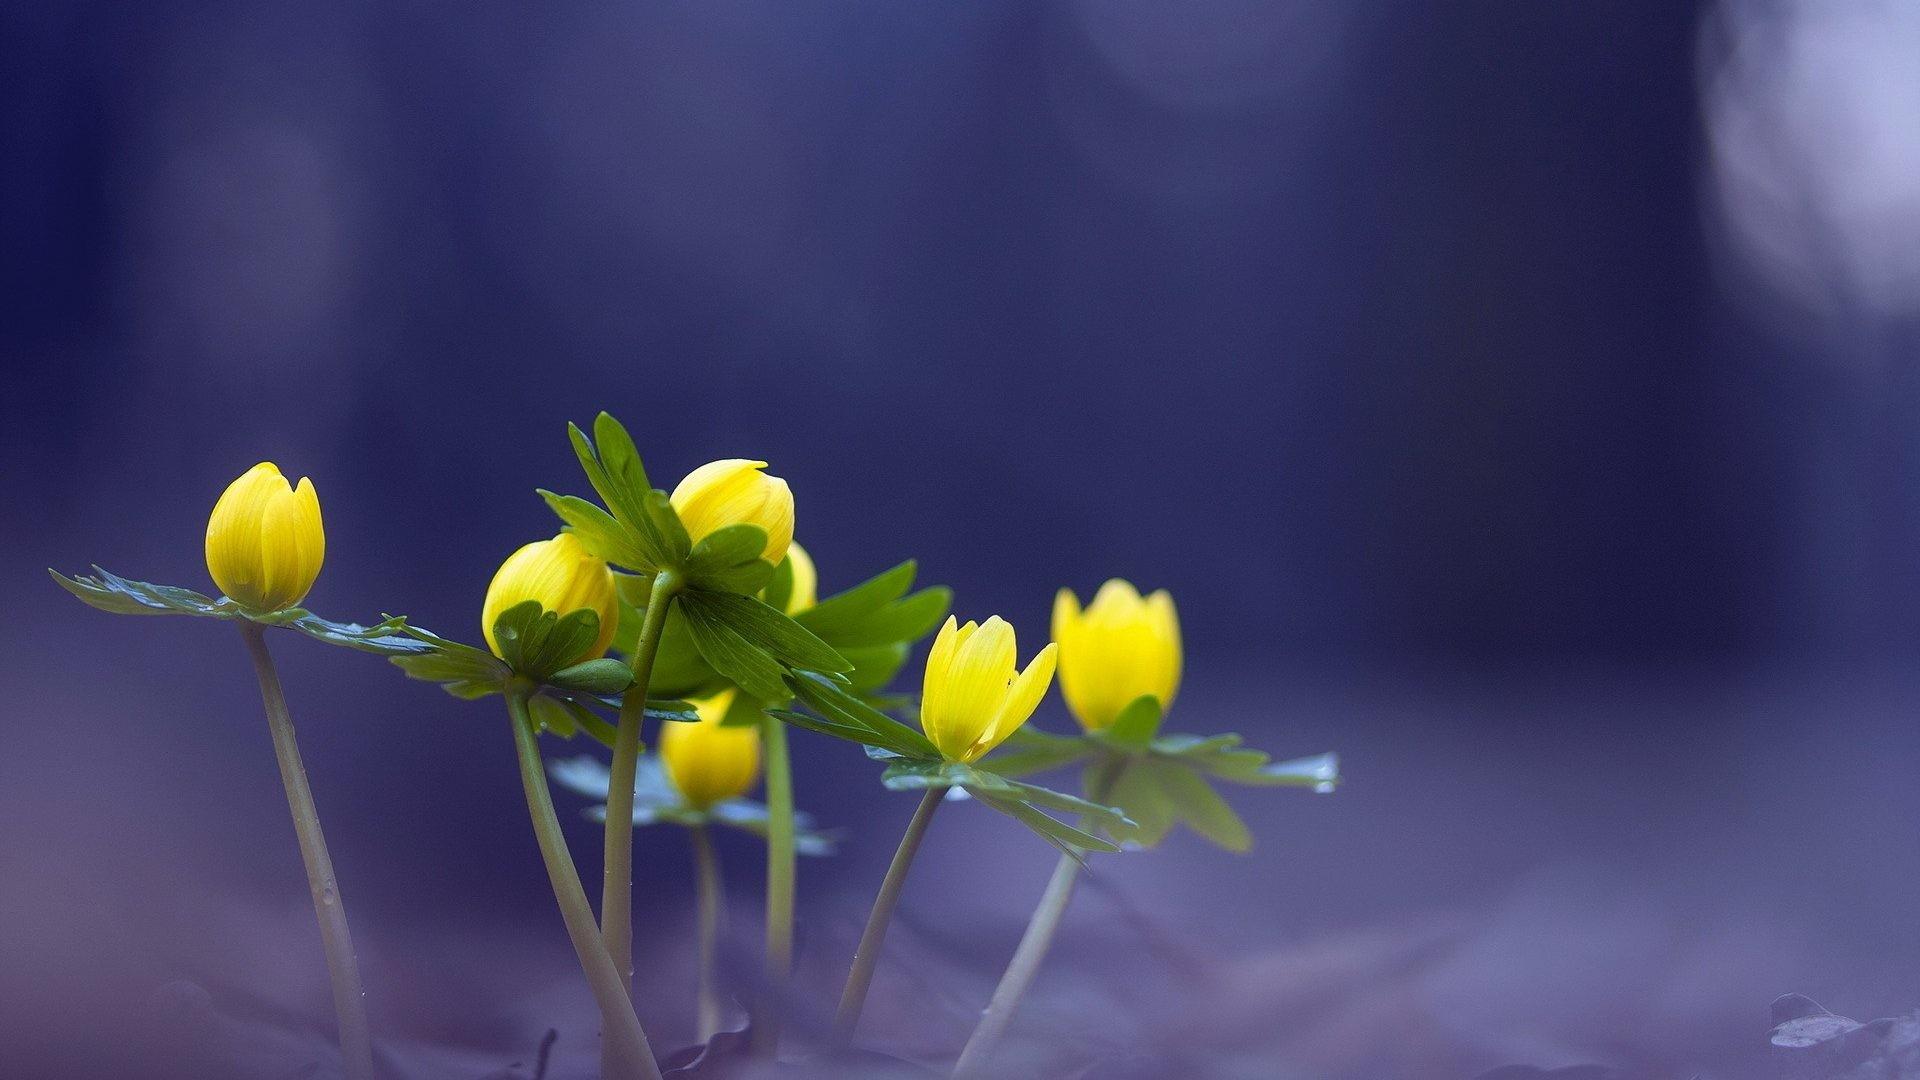 Bugs Eranthis Aconite Yellow Hyemalis Winter Flowers Nature 3d Desktop  Backgrounds – 1920×1200